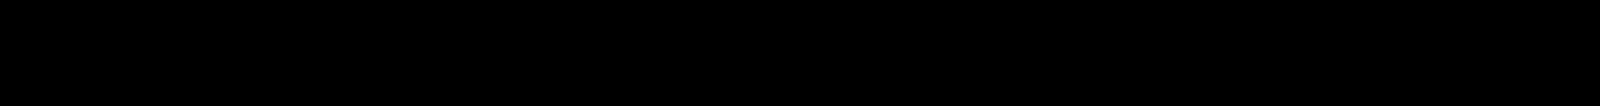 MFTourLogo_LogoTransparent.Black.png